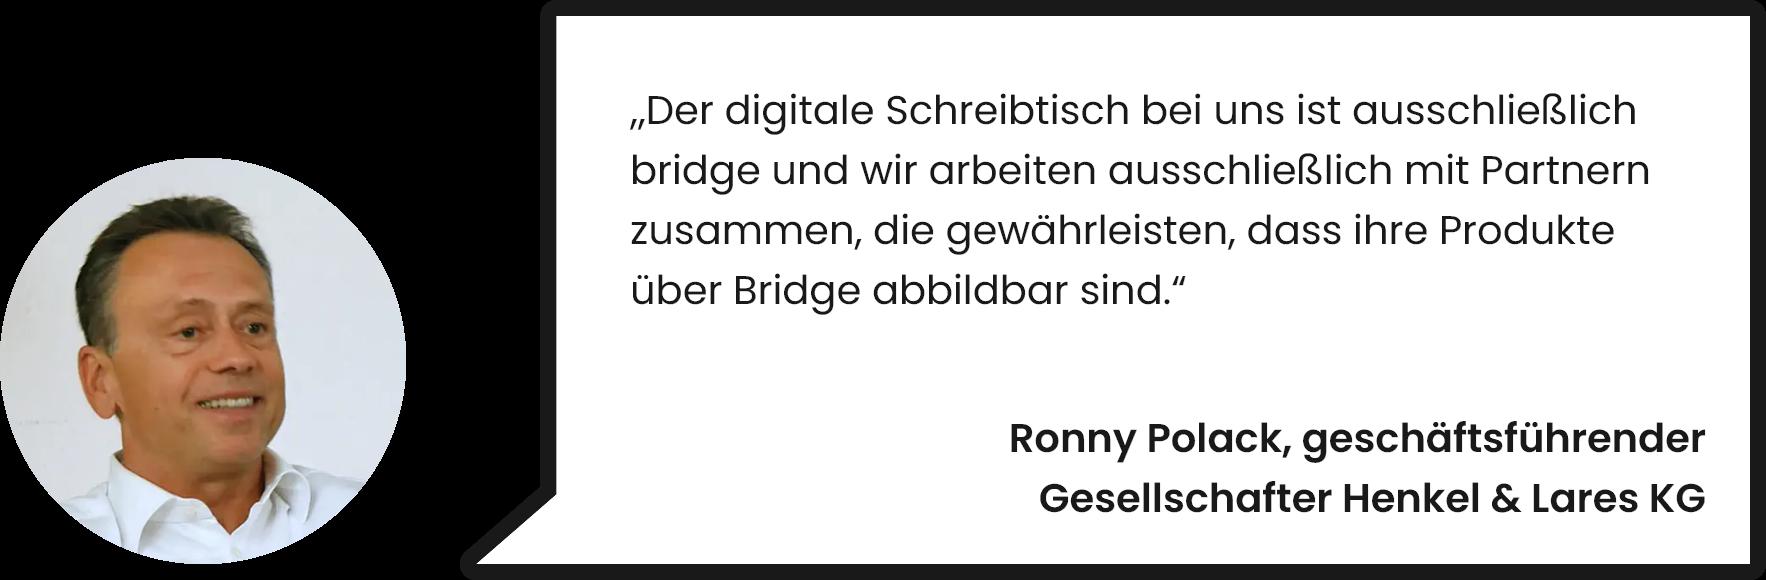 mobil-bild-zitat-2-bridge-kunde-henkel-und-lares-ronny-polack-digitalisierung-beratung-prozess